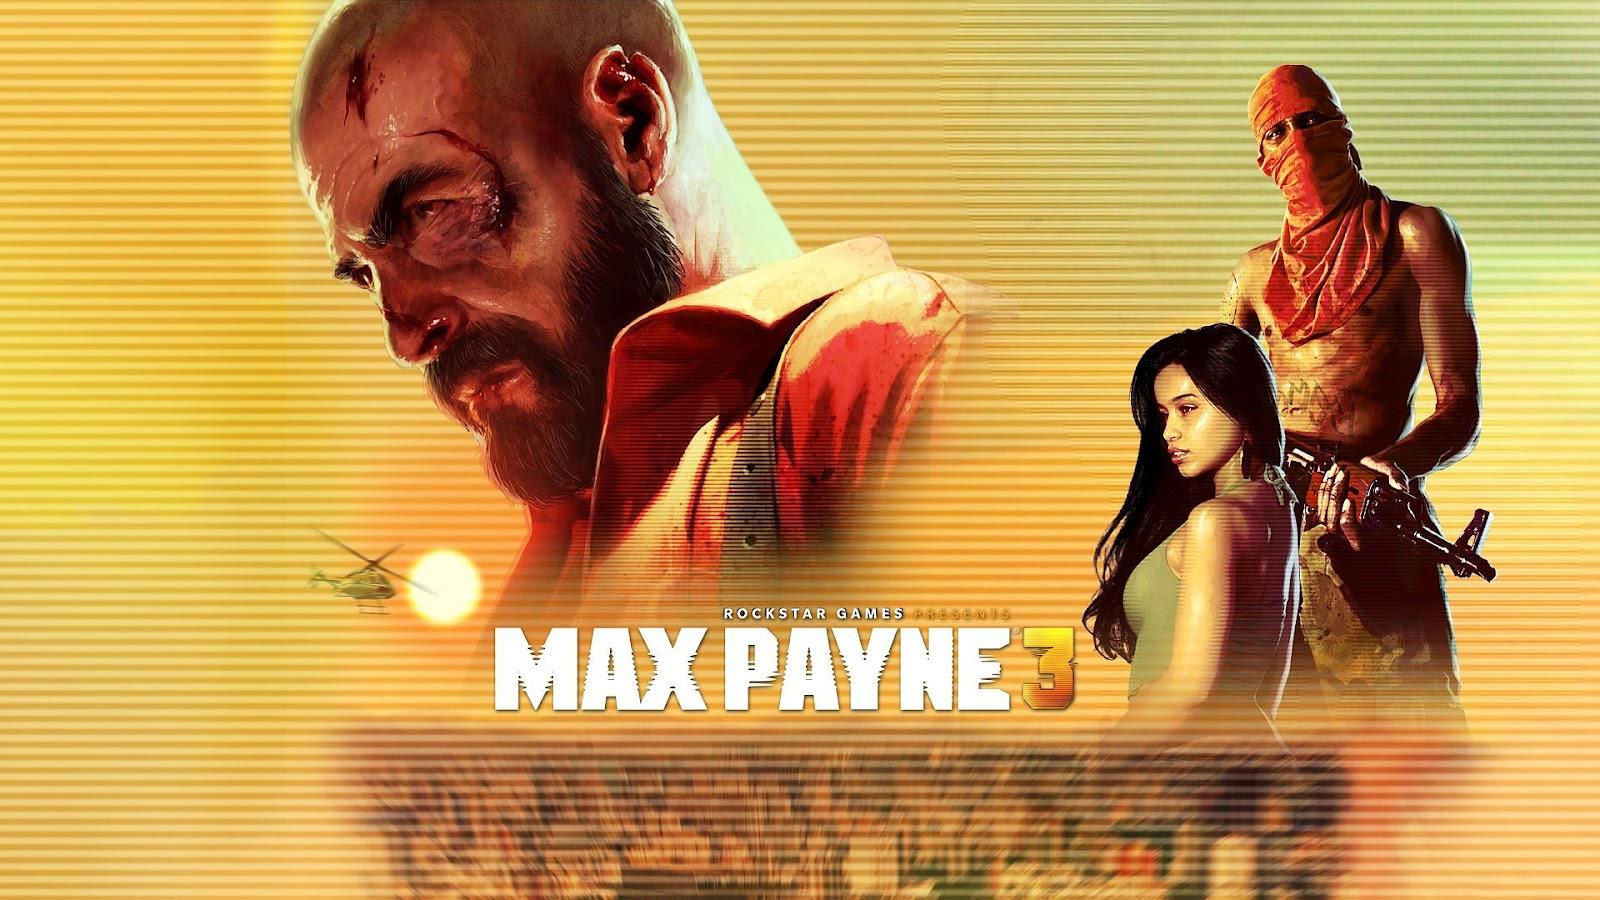 Max Payne 3 achtergrond HD Max Payne wallpaper 1600x900